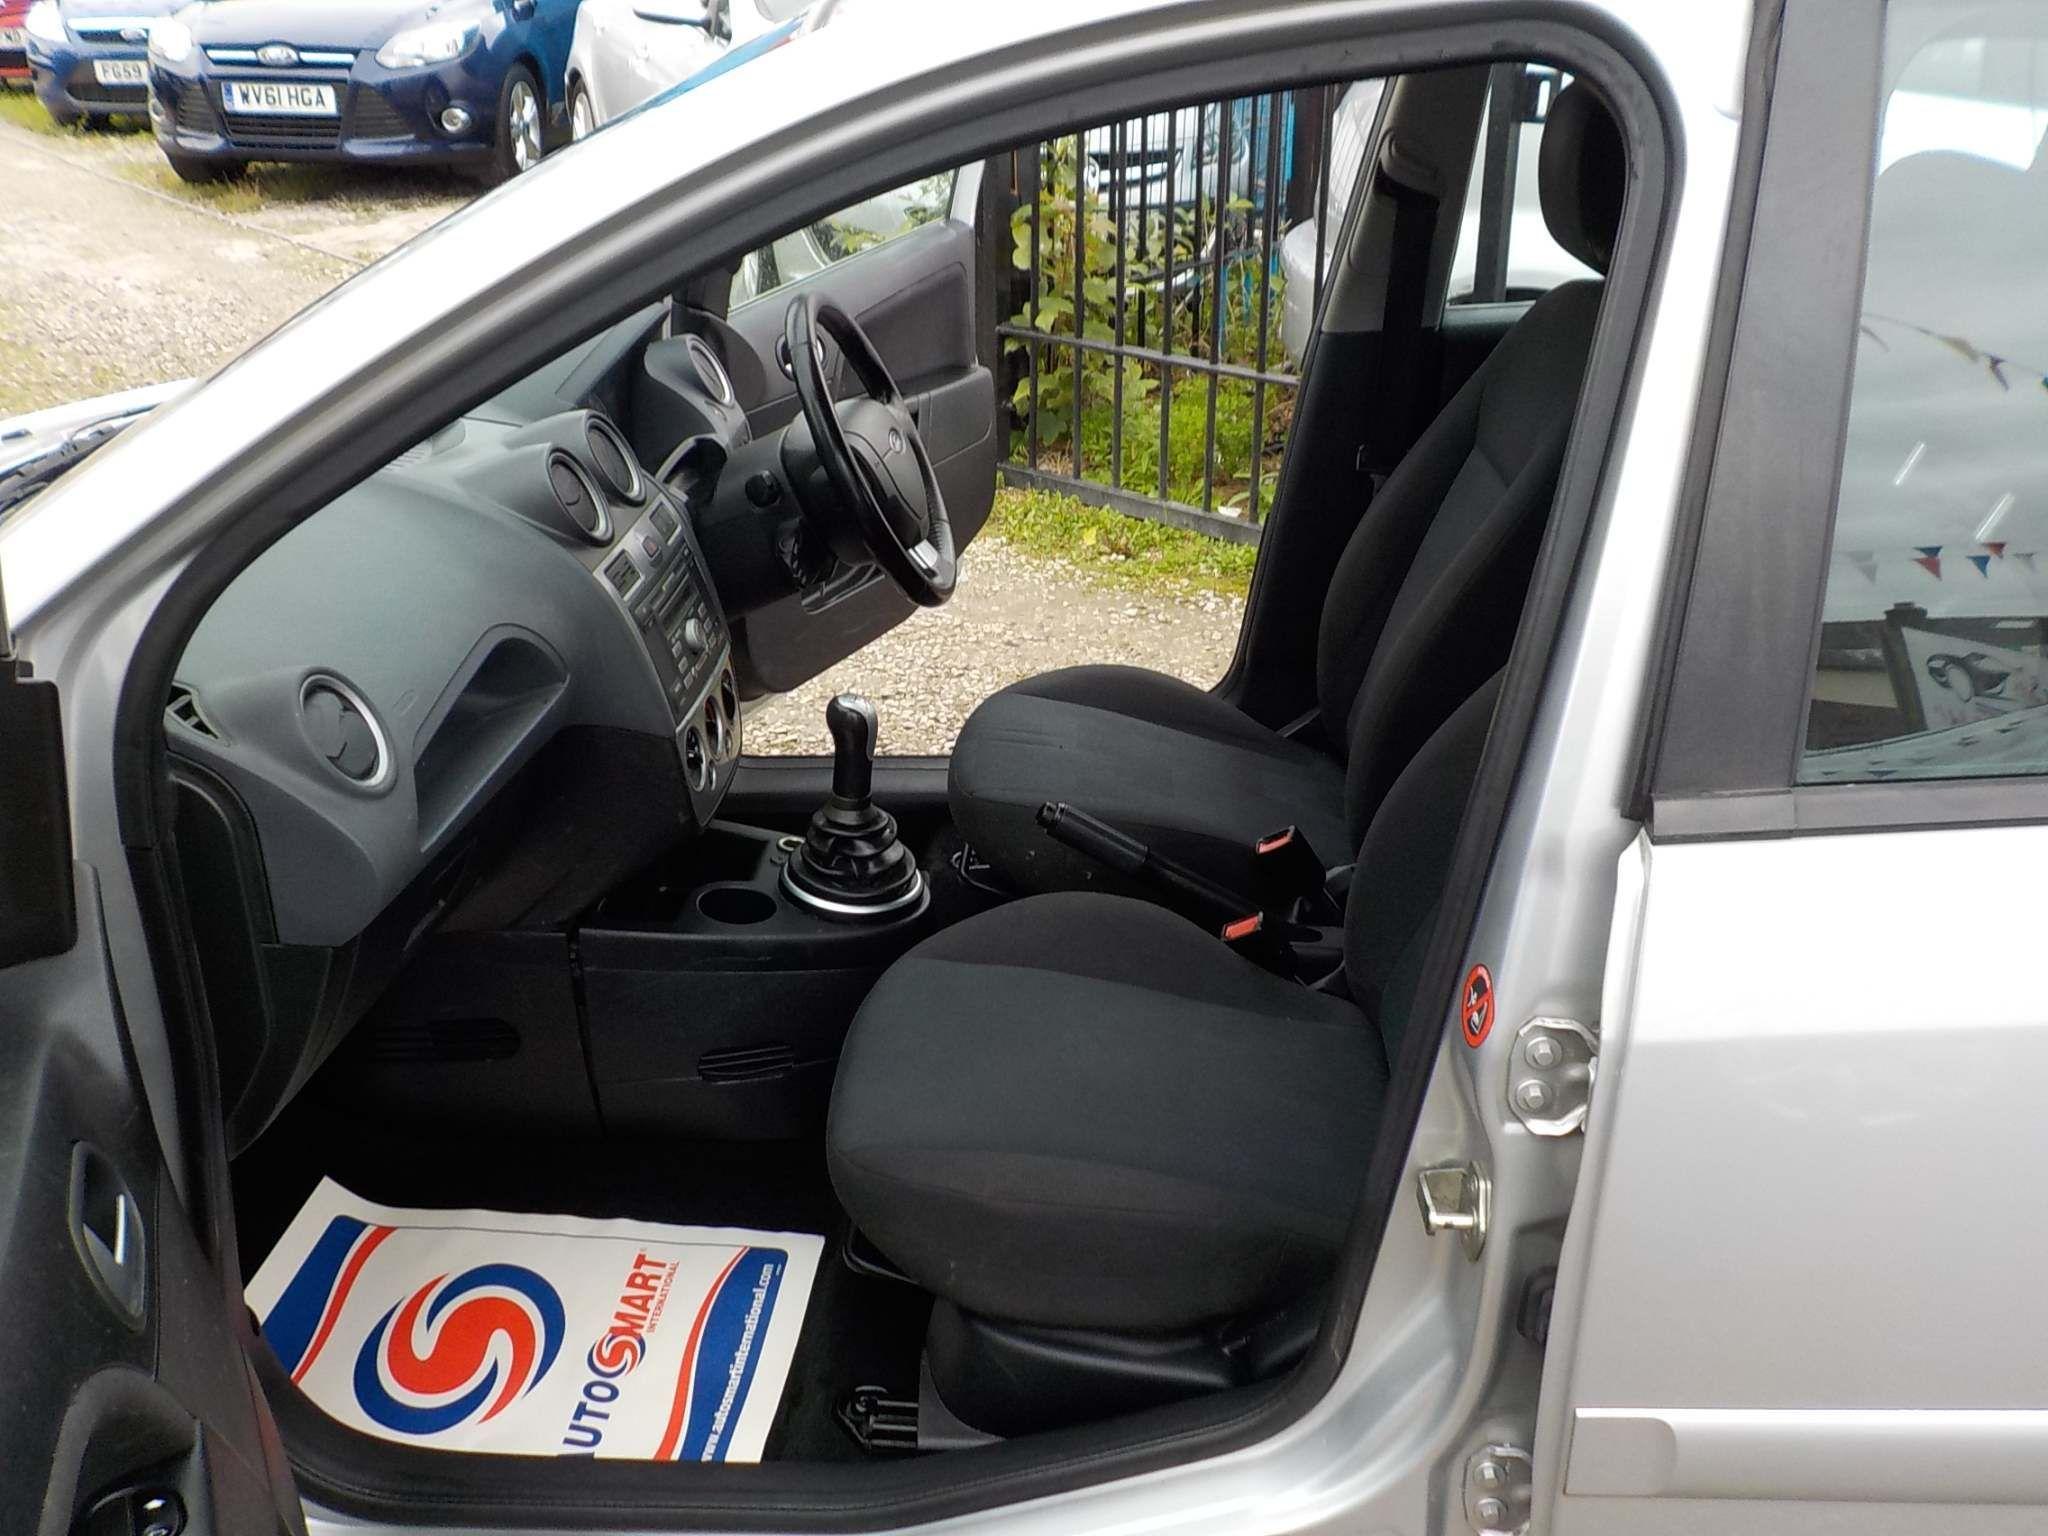 Ford Fiesta 1.4 TD Zetec Climate 5dr